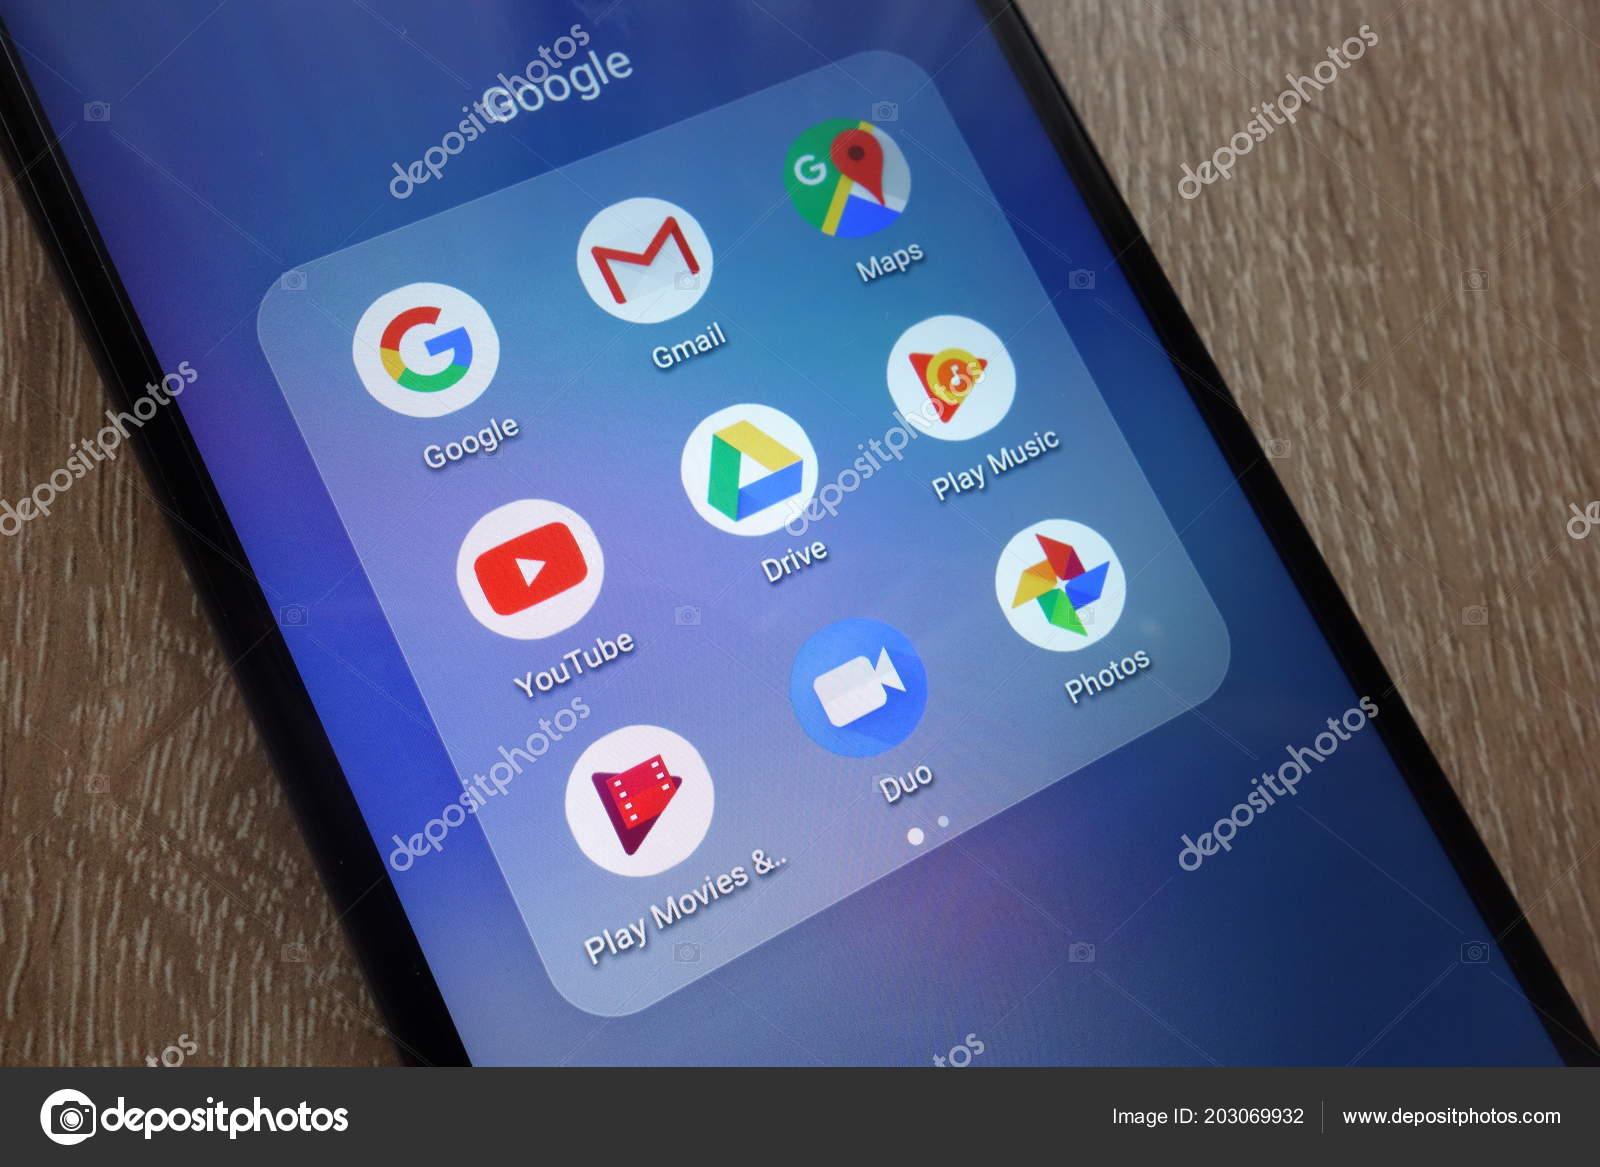 Konskie Poland June 2018 Google Apps Including Gmail Maps Youtube